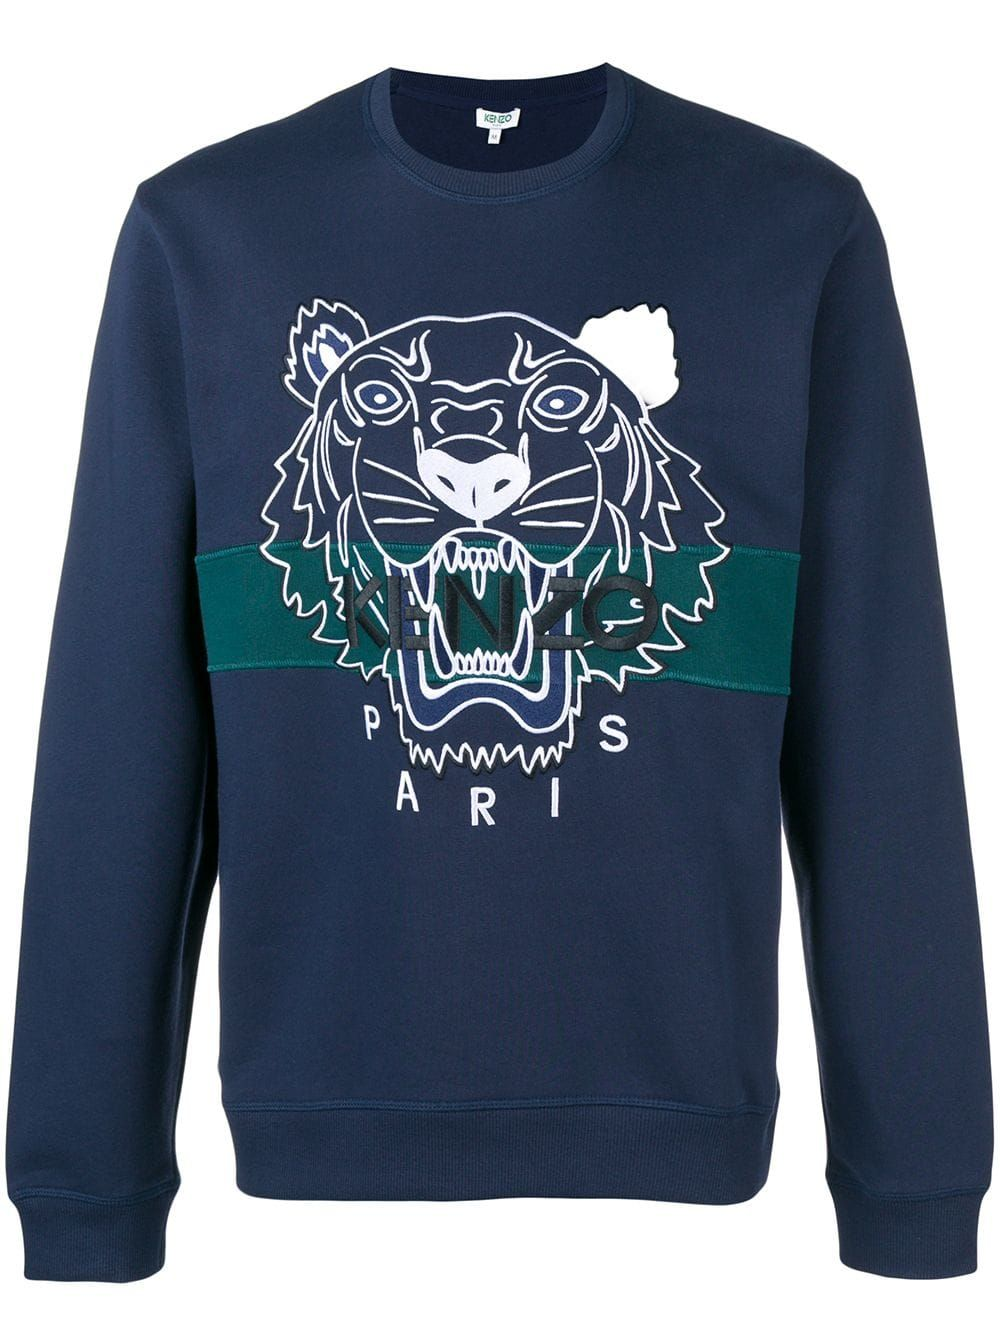 55e99145f2 Kenzo Tiger sweatshirt - Blue in 2019 | Products | Kenzo ...